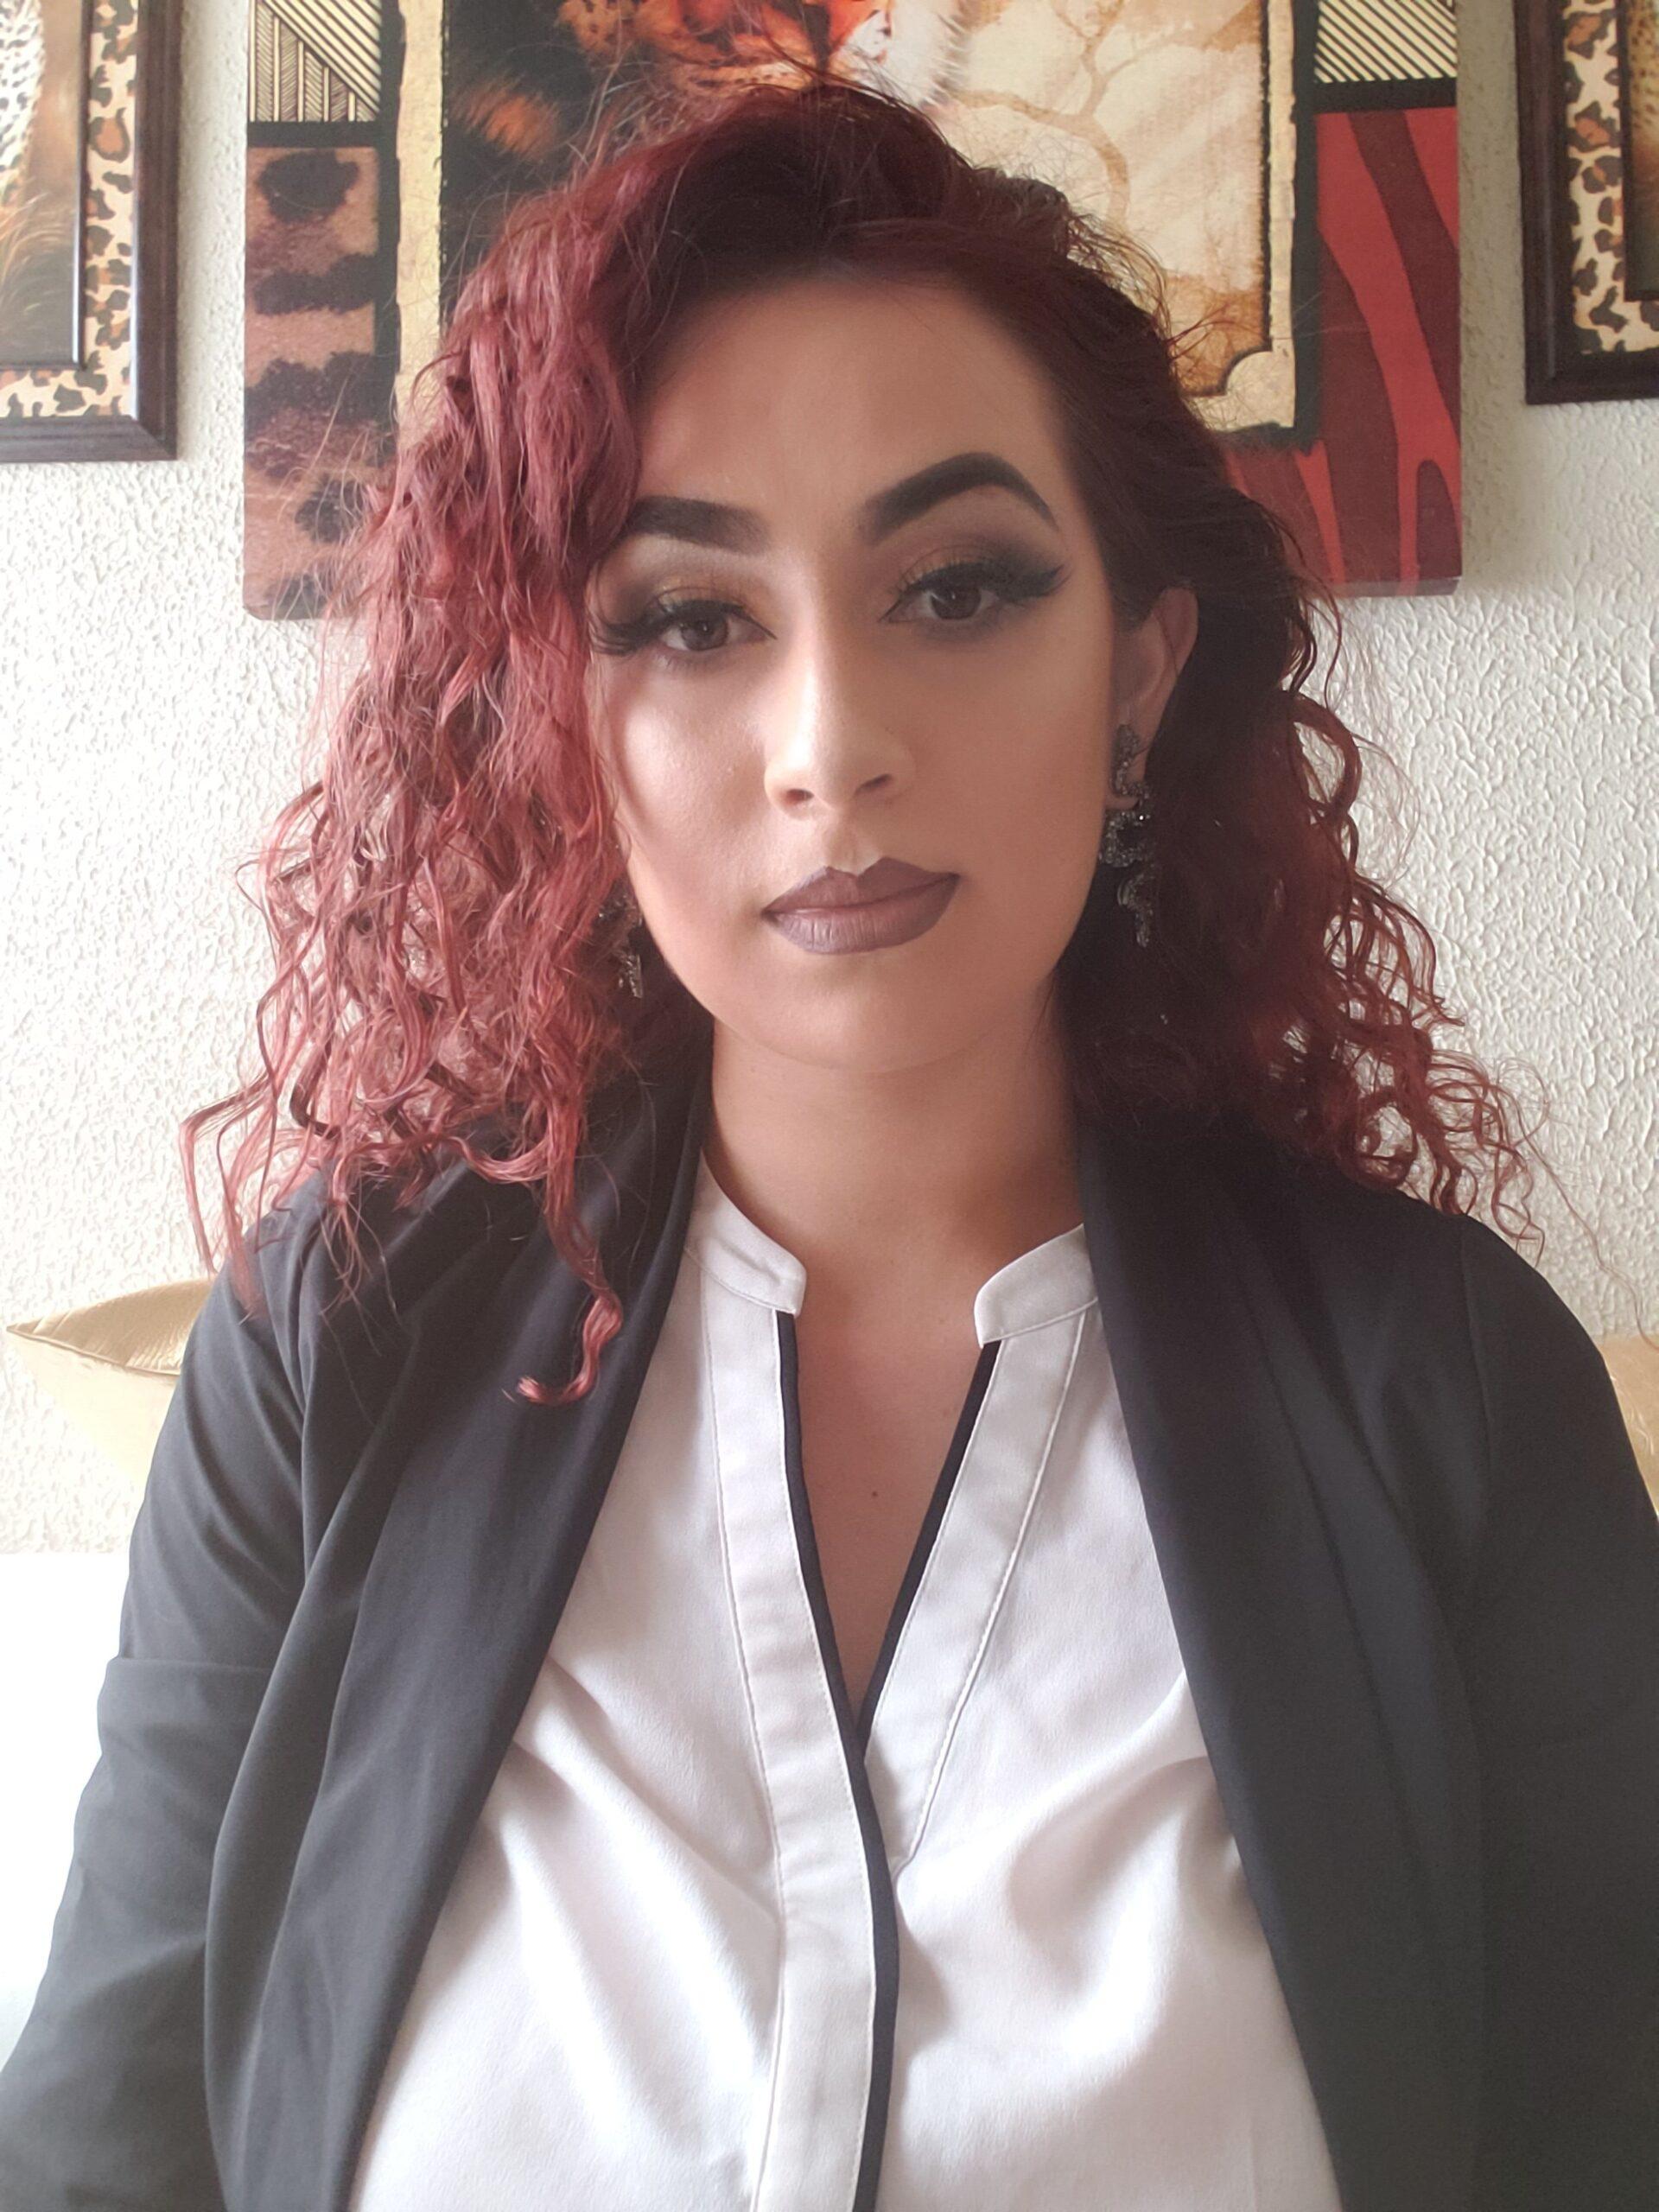 Jasmine Morales